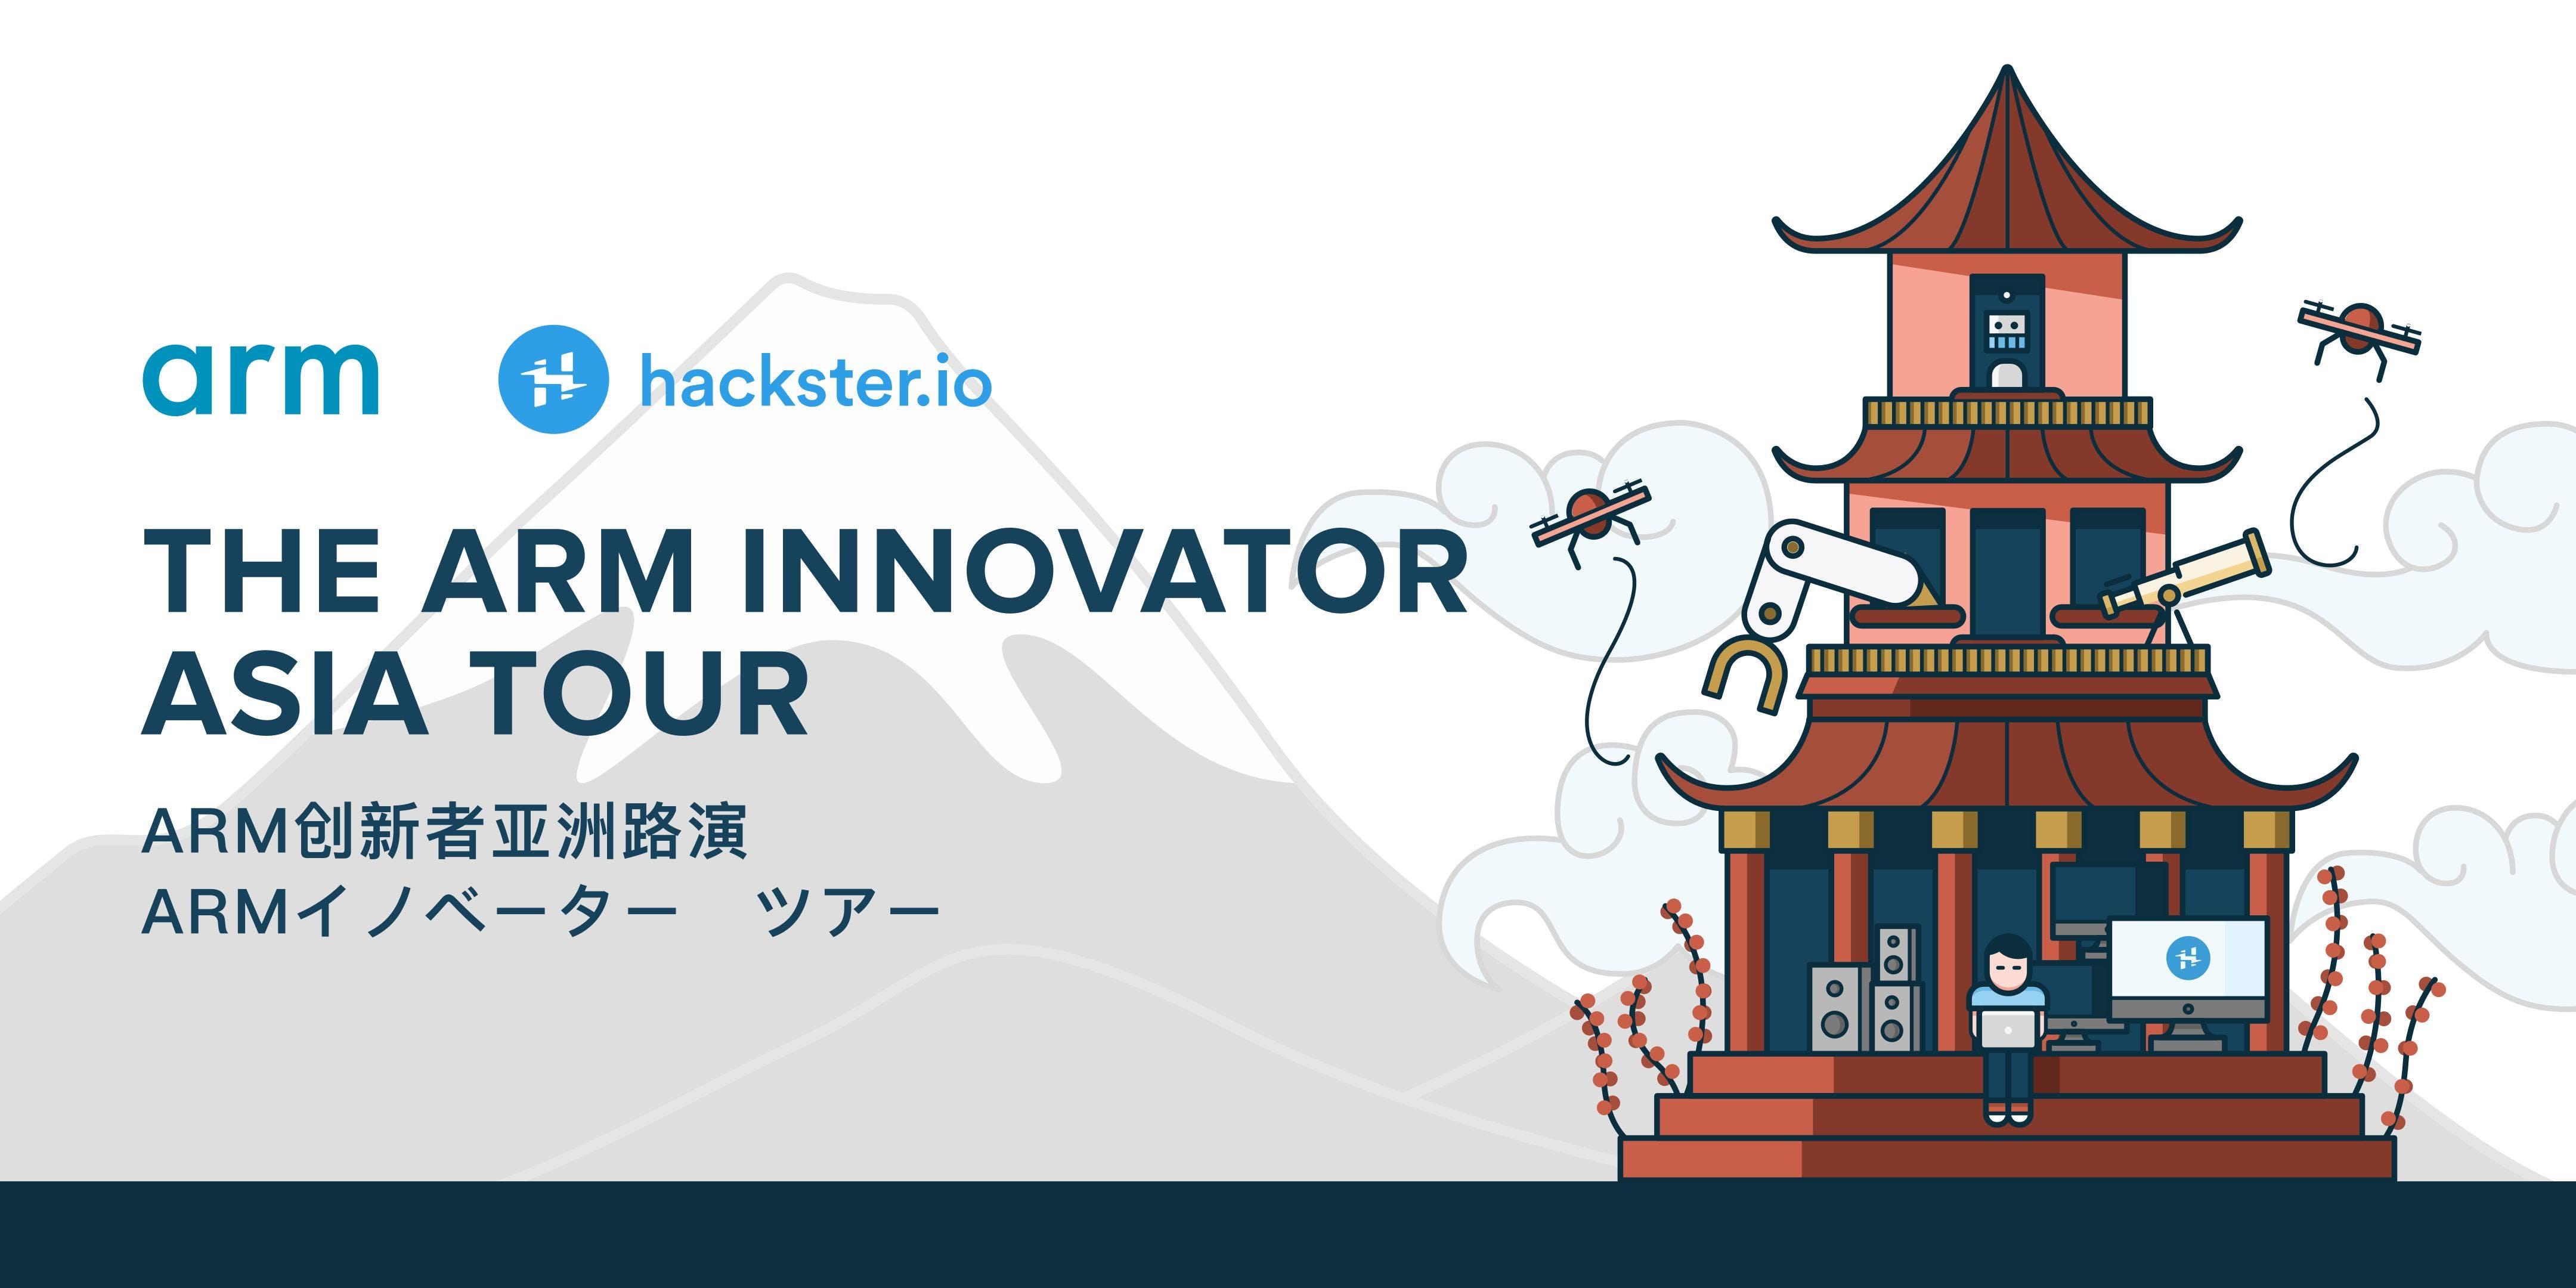 The Arm Innovator Asia Tour - Tokyo // Armイノベ